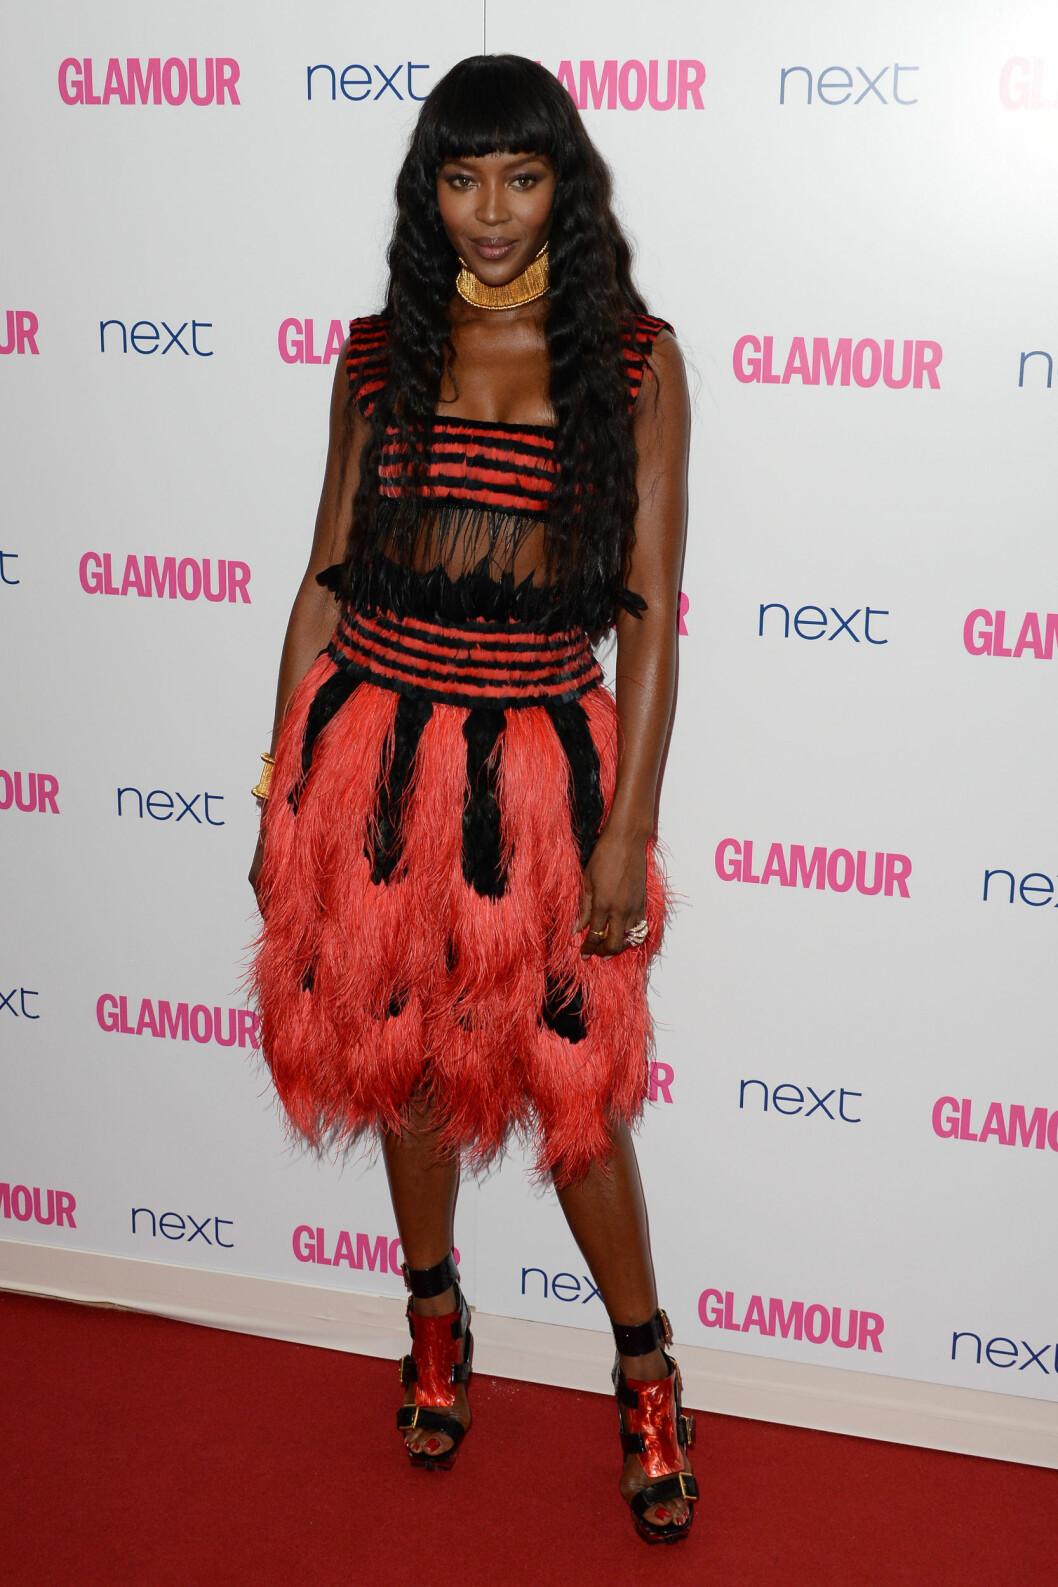 <strong>FJÆR:</strong> Naomi Campbells spesielle fjærkjole i rødt og sort, kombinert med voldsomme sko og smykker på Glamour Awards i juni, ble nok for mye for Seoghør.nos lesere - som trillet terningen til én. Foto: Stella Pictures